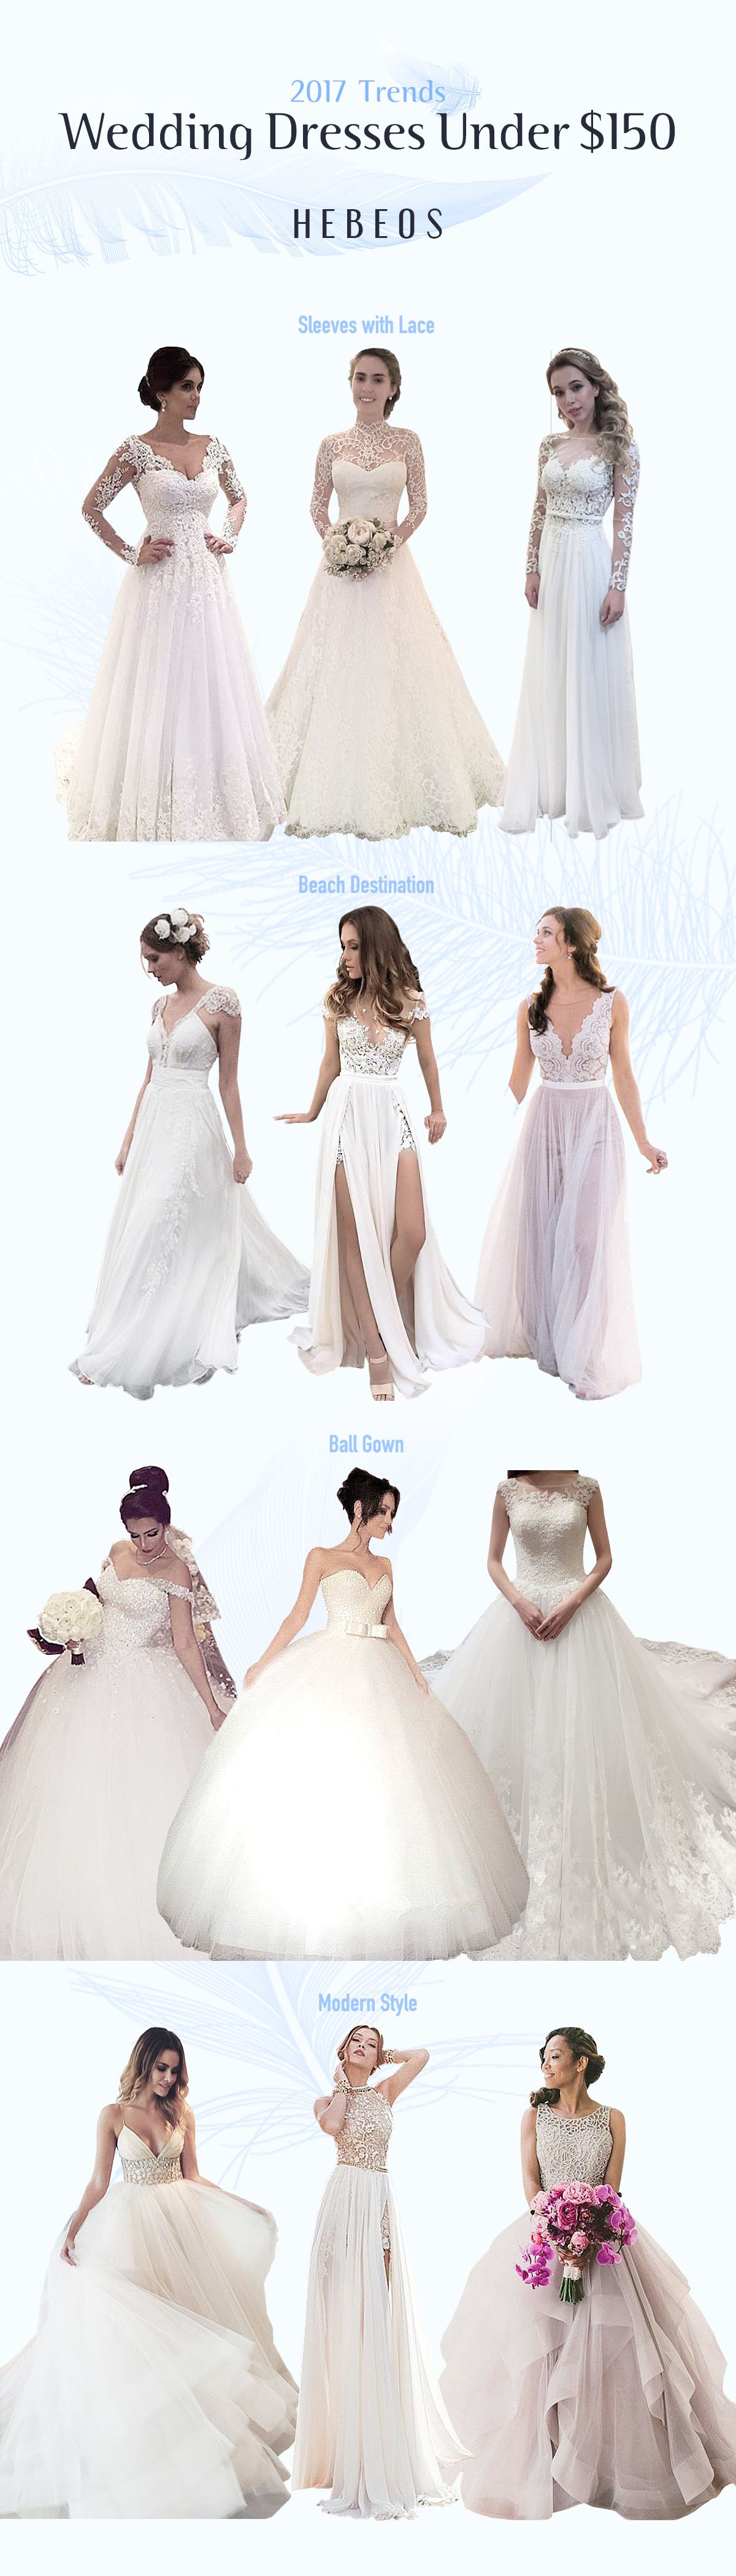 Hebeos wedding dresses autumn sale cheap wedding dresses for